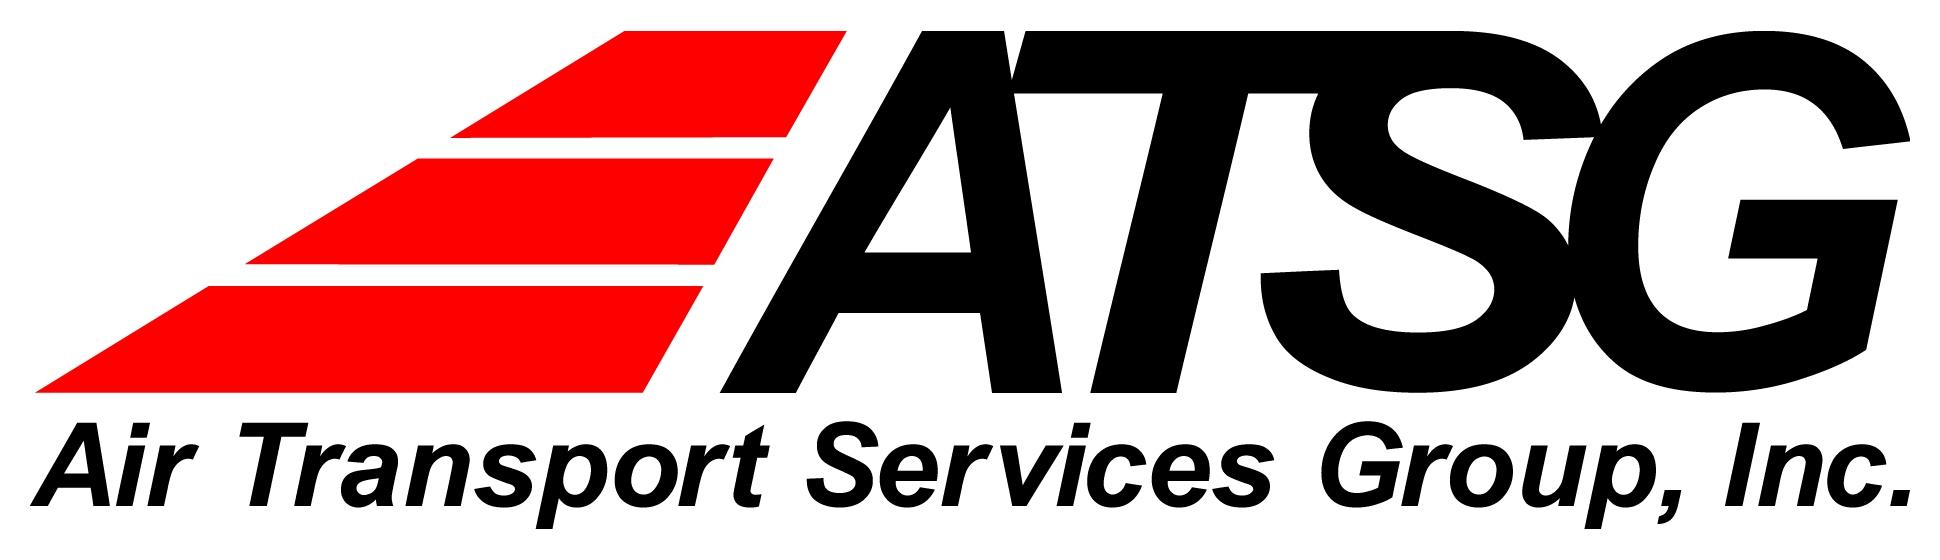 ATSG-logo-560x1940px-2